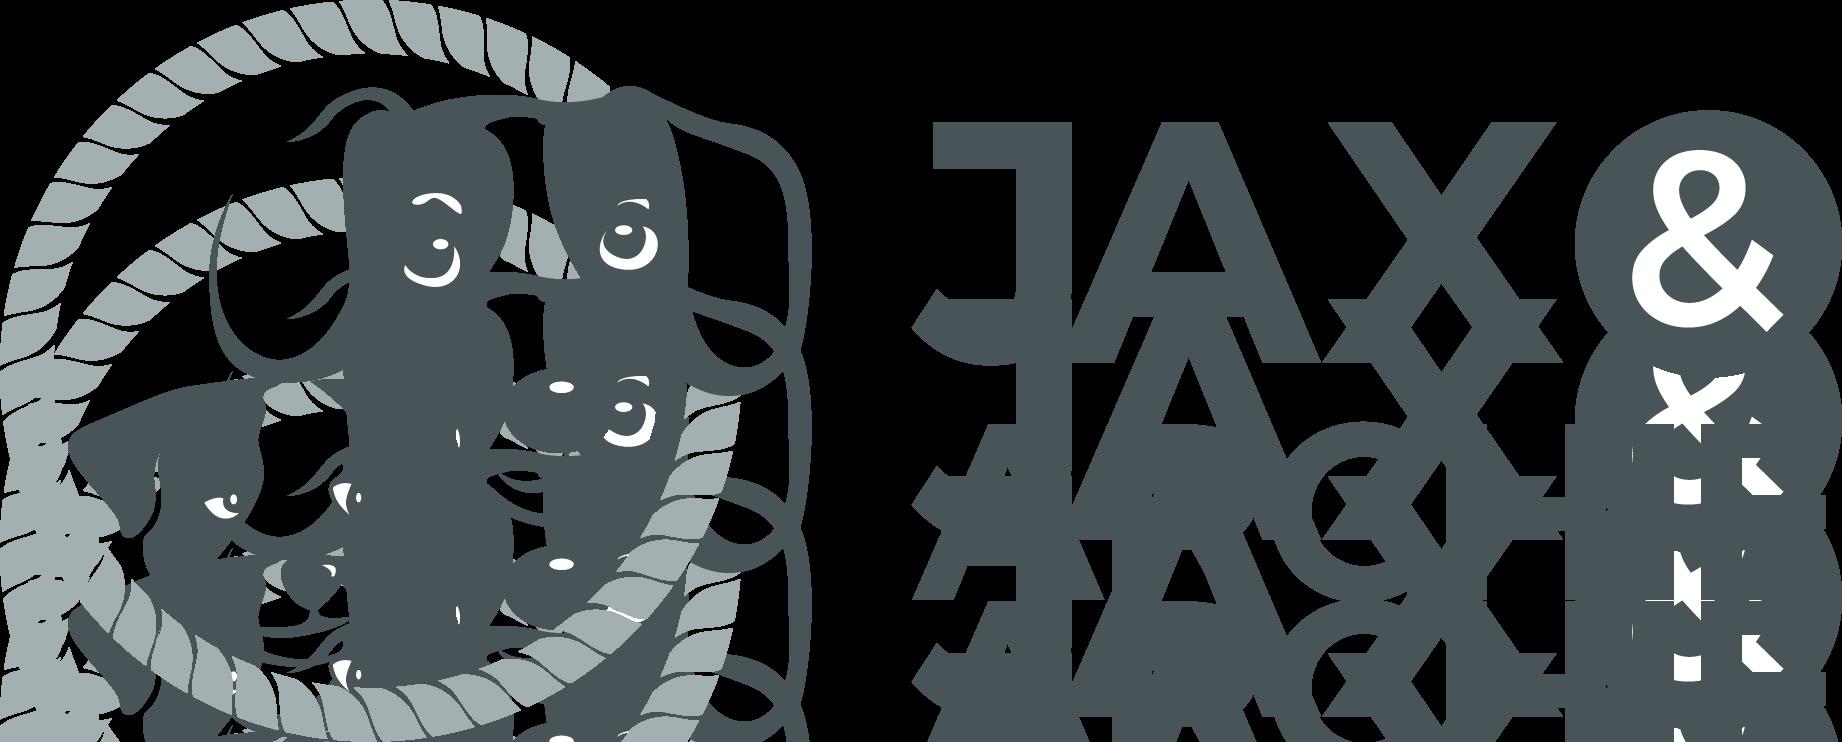 JaxArchie-LOGO.png